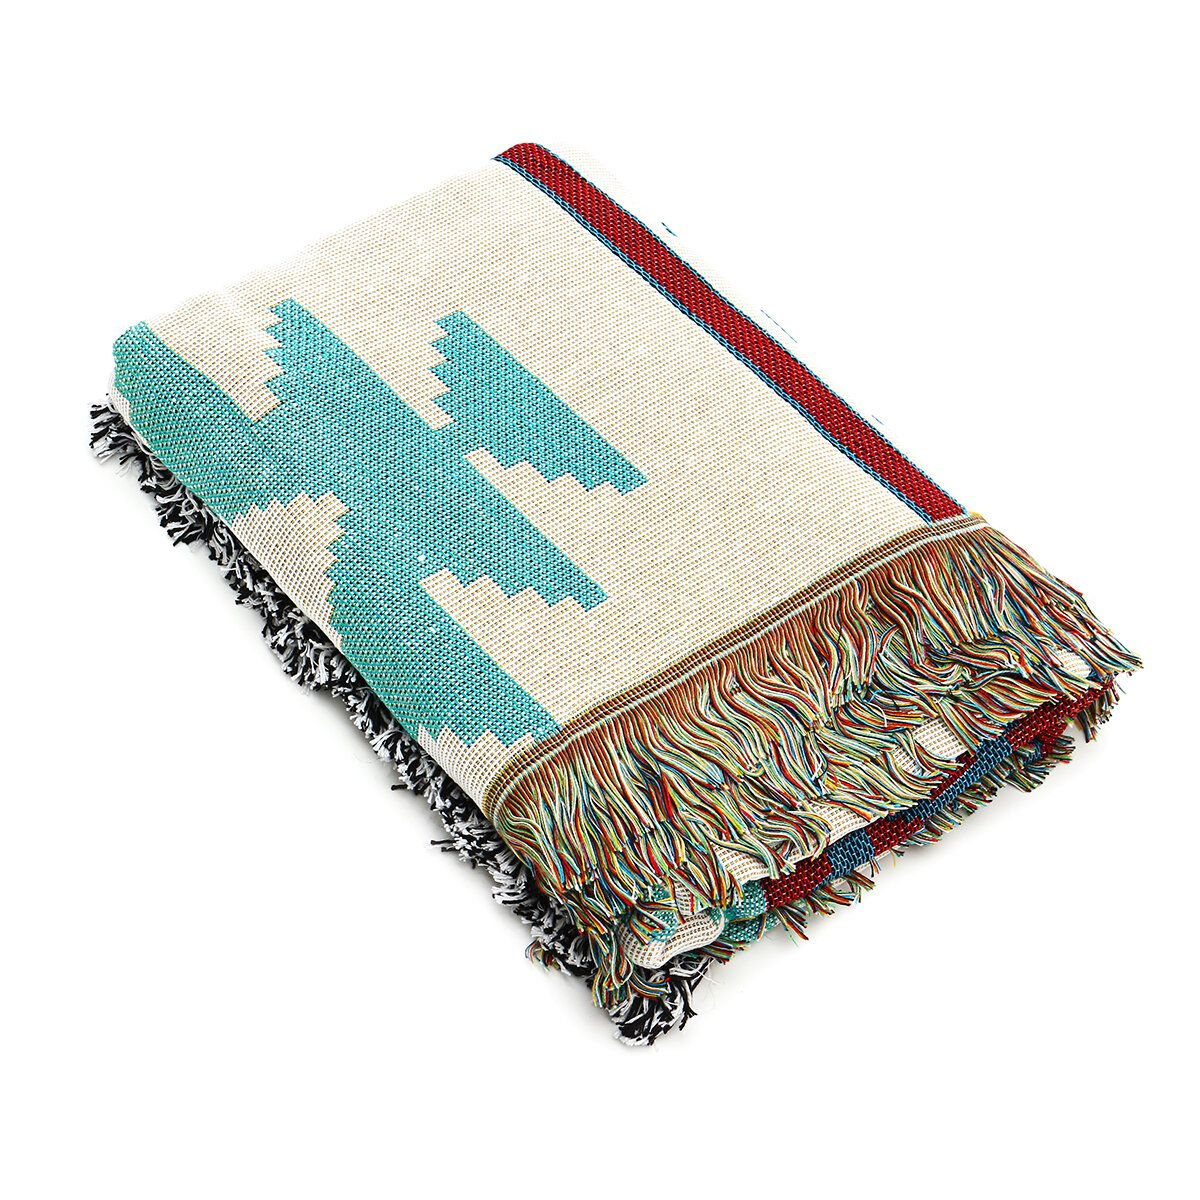 Retro Navajo American Style Geometric Popcap Upholstery Leisure Carpet Air Conditioning Sofa Blankets